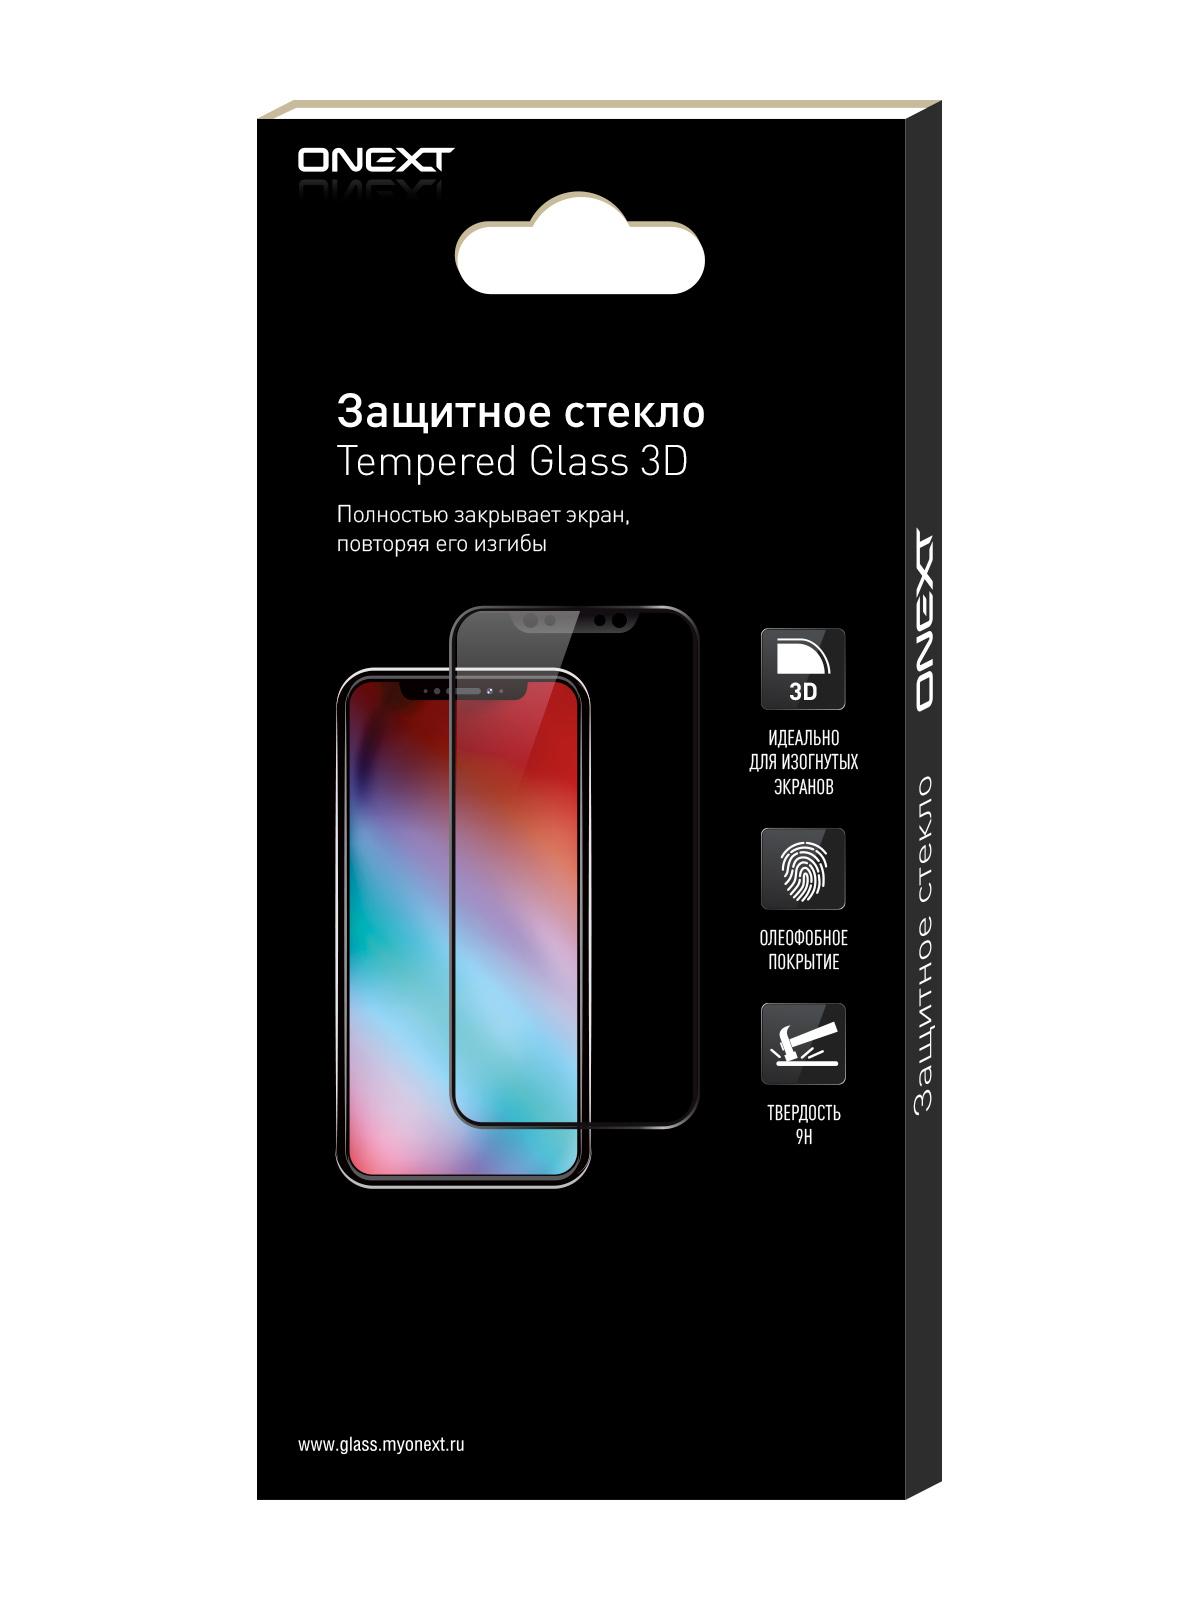 Защитное стекло ONEXT для Apple iPhone 7 Red